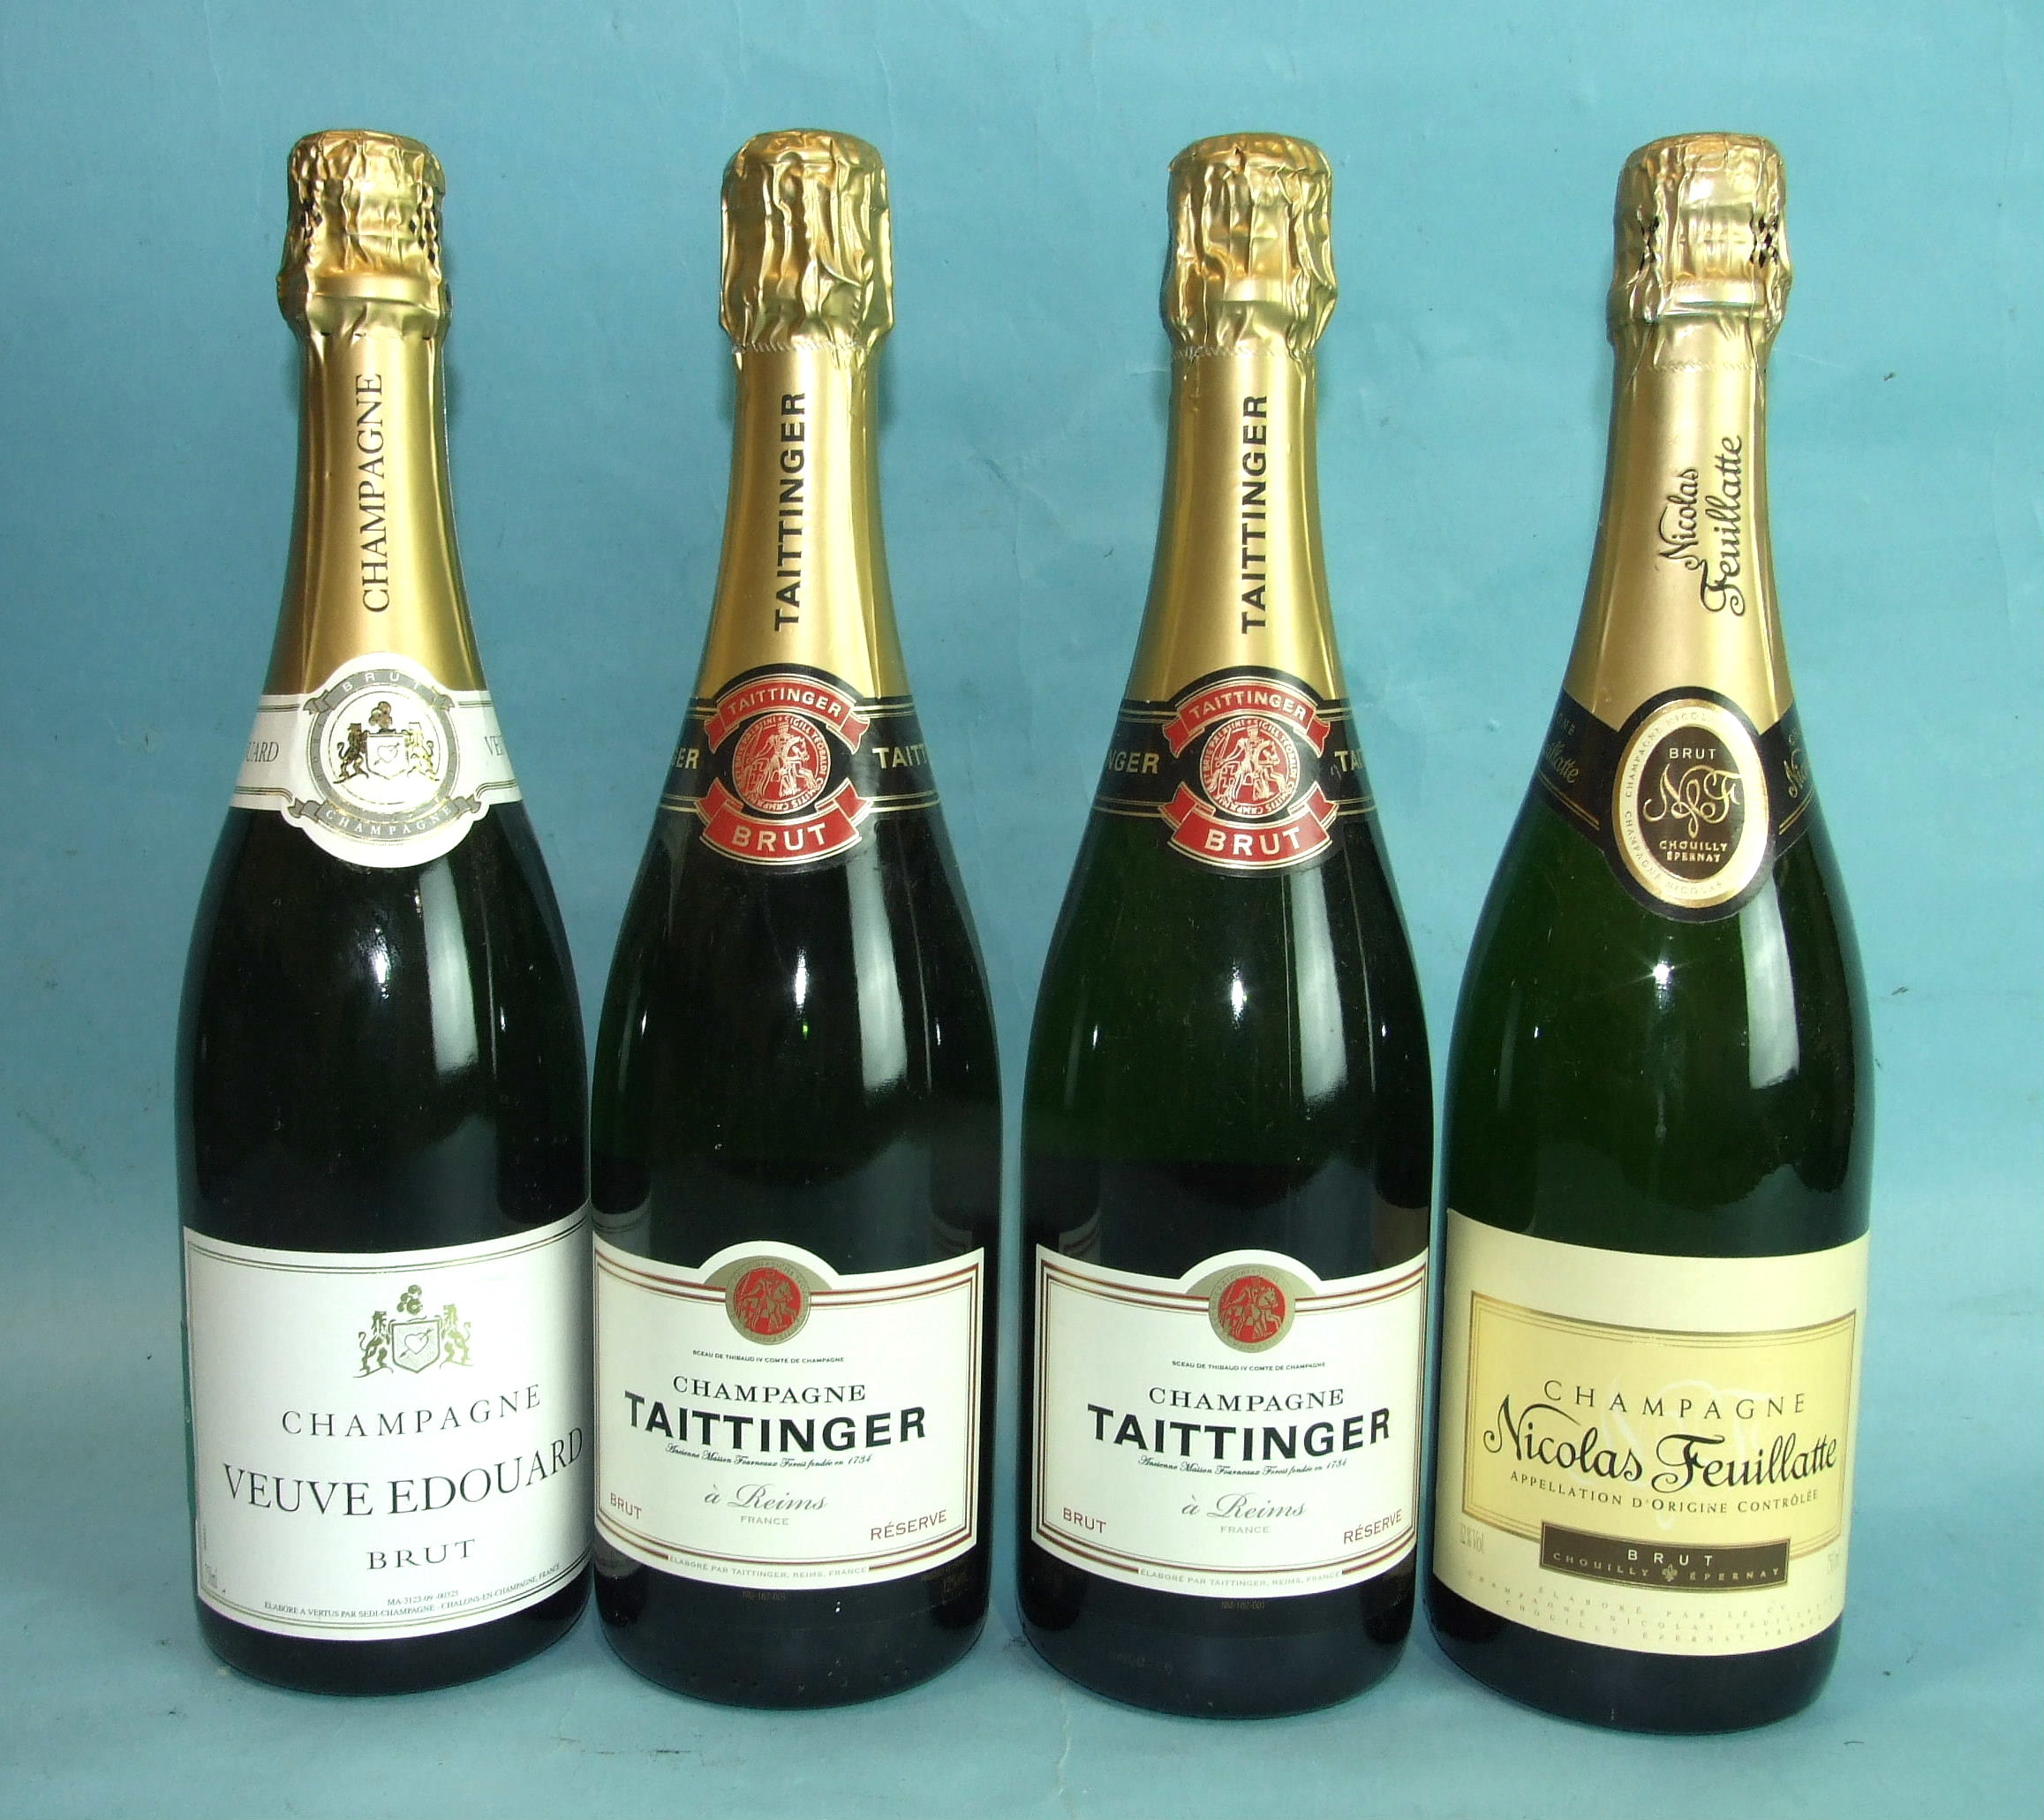 Lot 5 - Tattinger Brut Champagne, two bottles, Nicolas Feuillatte Brut Champagne, one bottle and Veuve